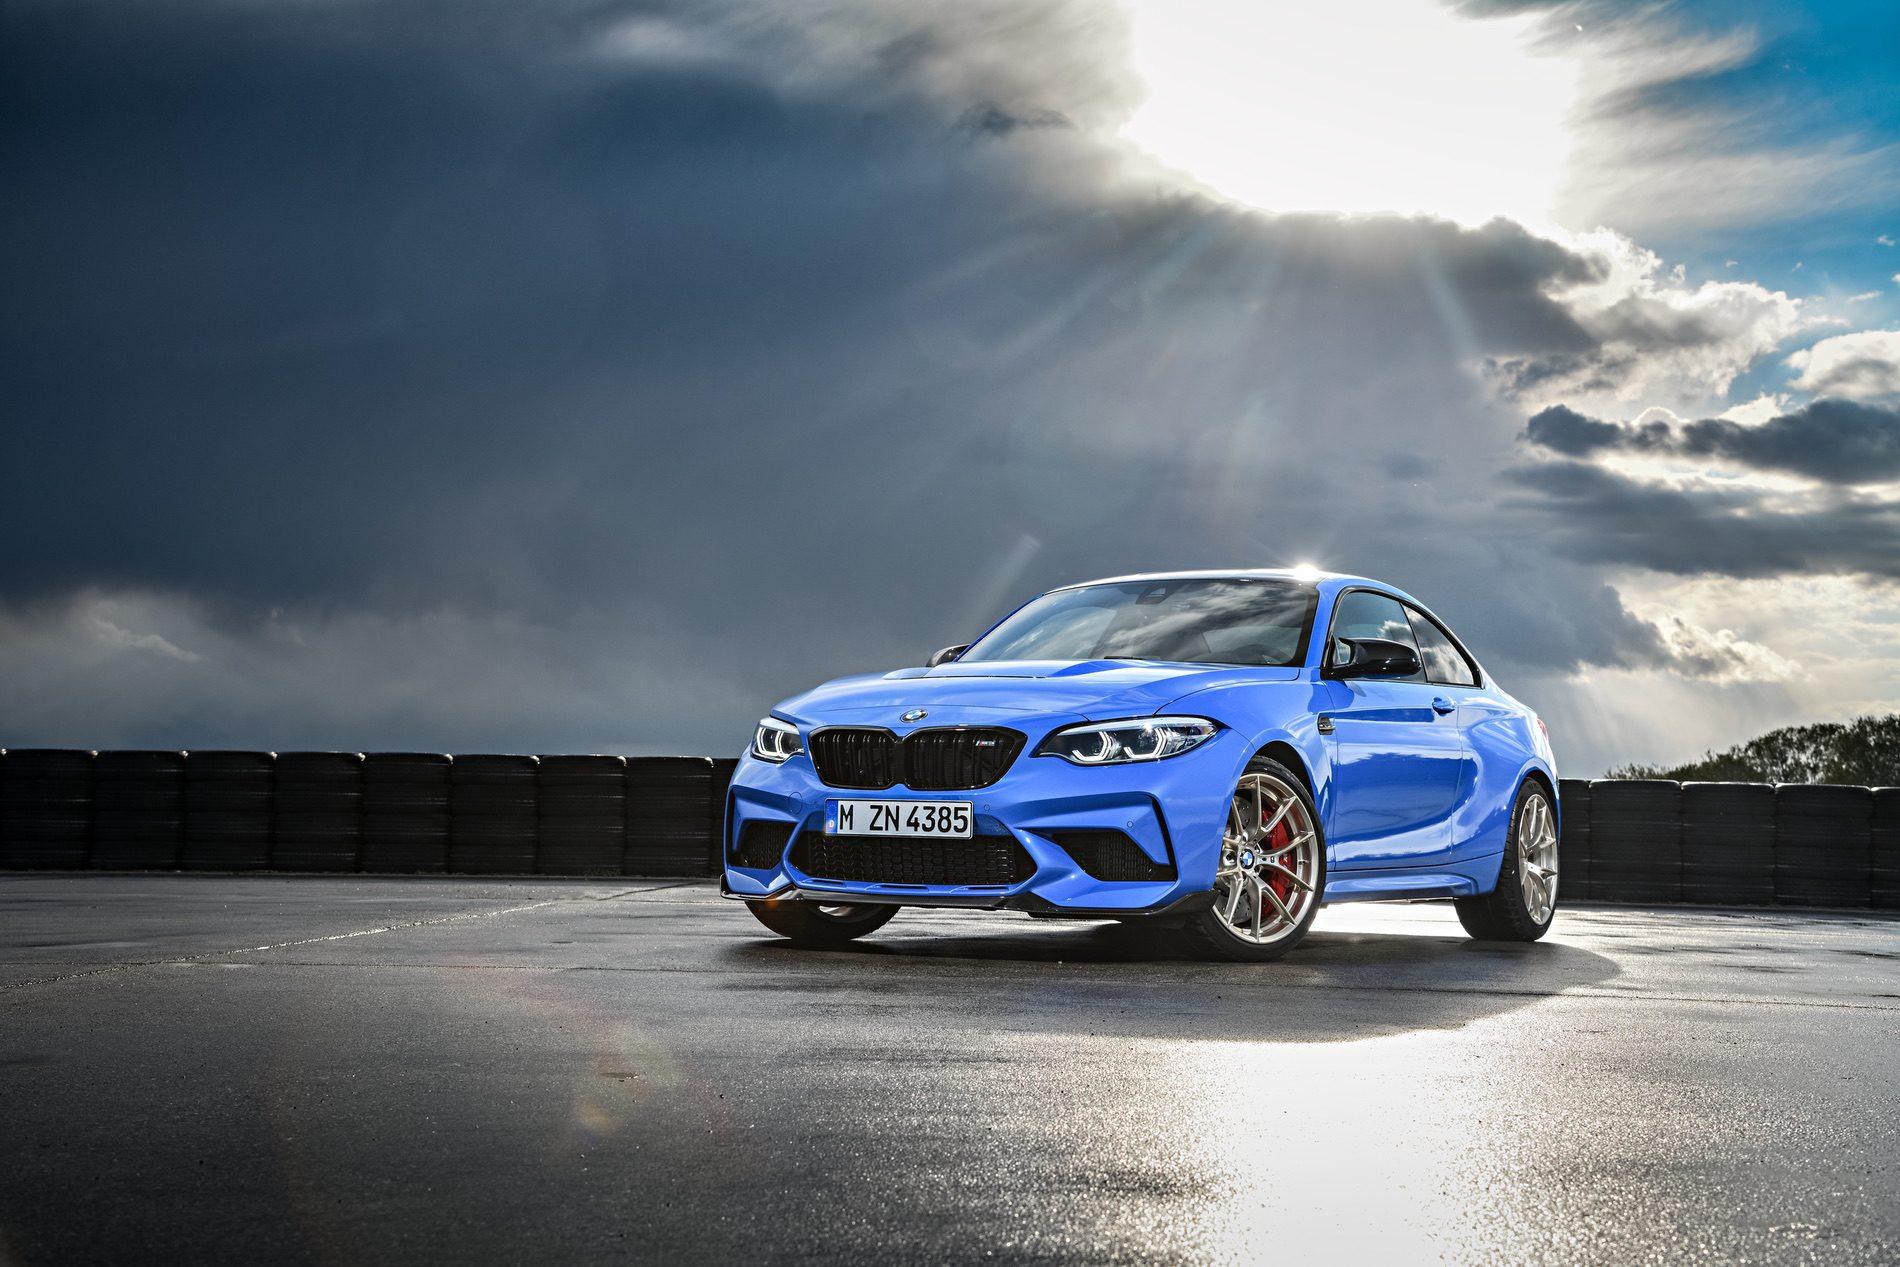 2021 BMW M2 CS Misano Blue 87